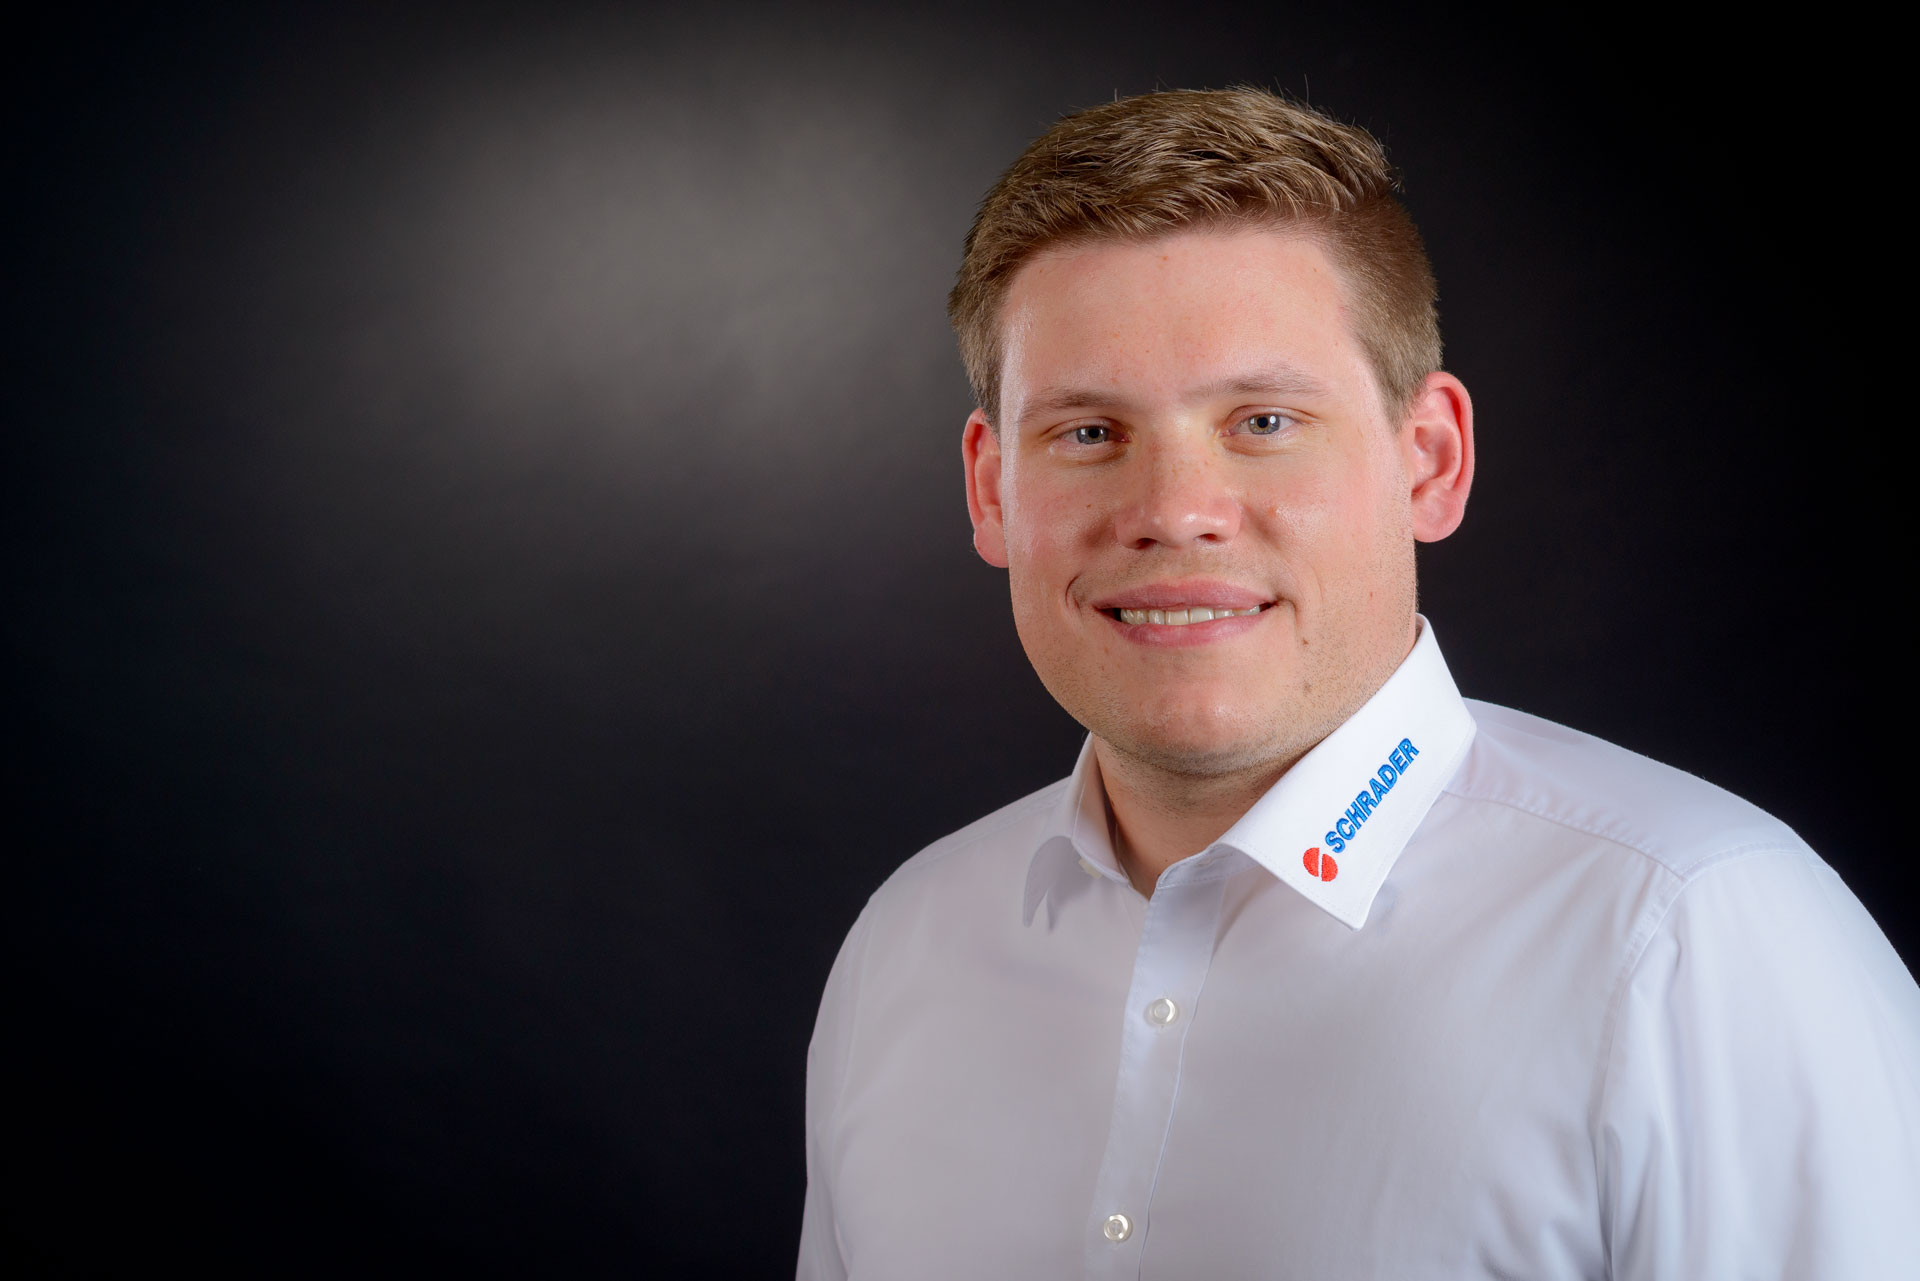 Philipp-Bockey